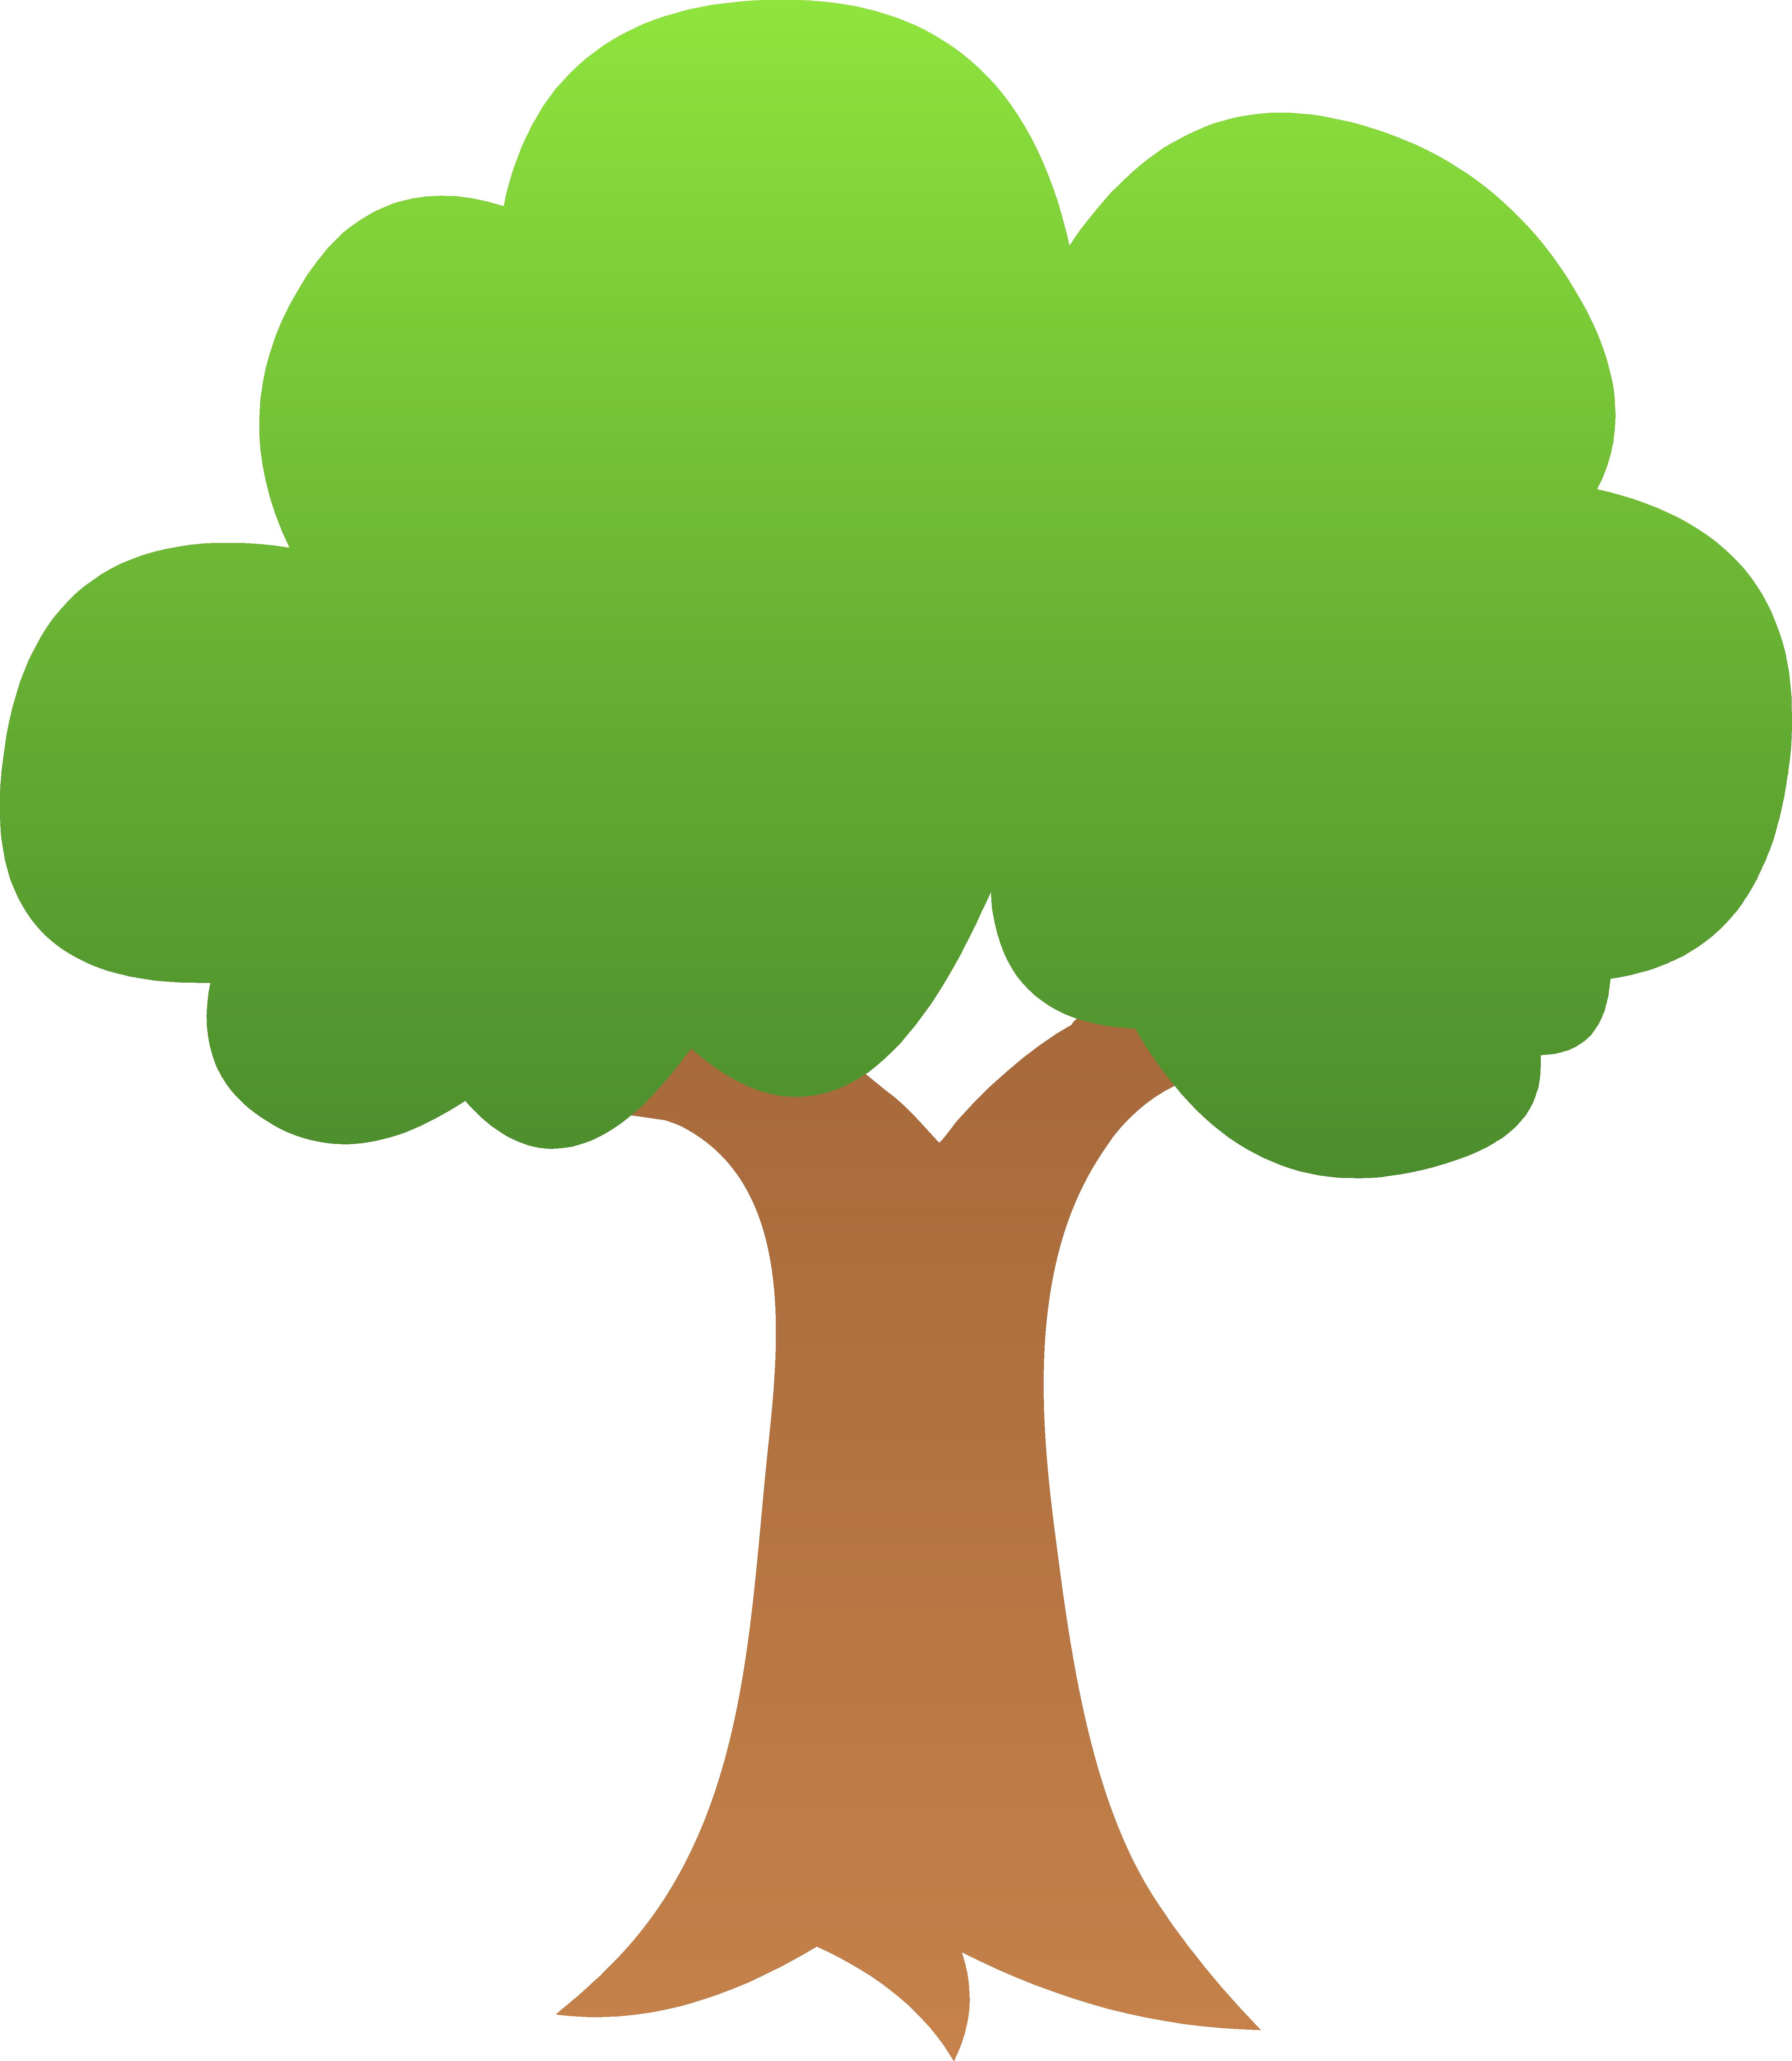 jpg download Tree Clip Art Transparent Background